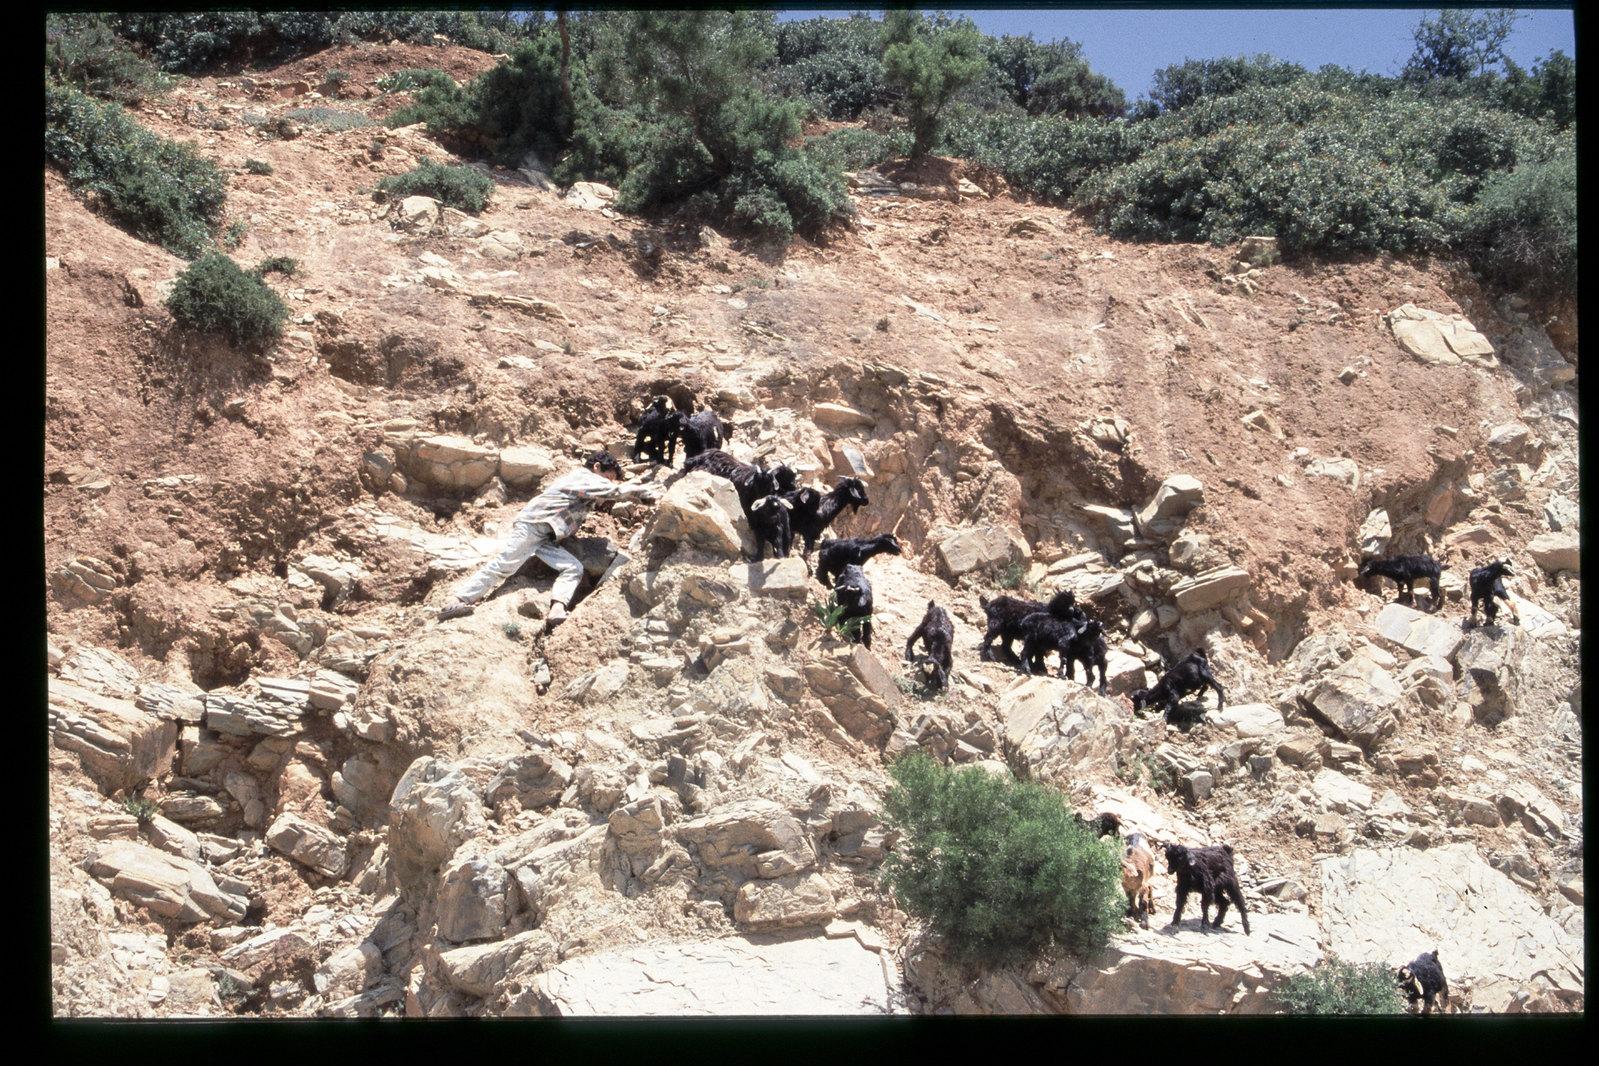 Maroc oriental - Gardien de chèvre